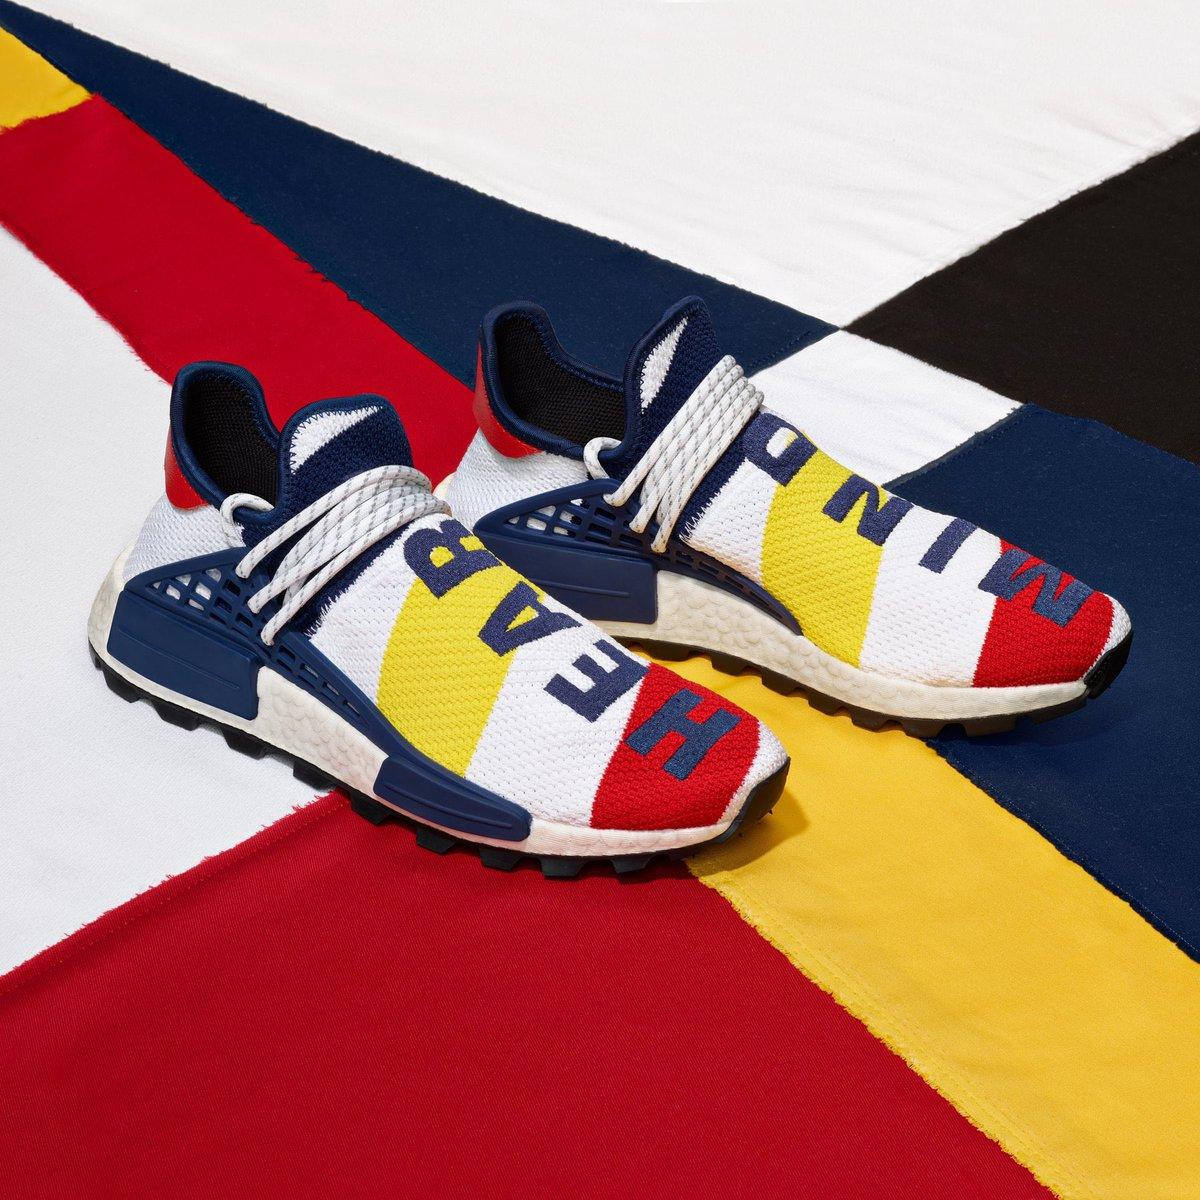 HERITAGE. The @adidasoriginals x @bbcicecream collection is out Saturday. http://adidas.com/pharrell